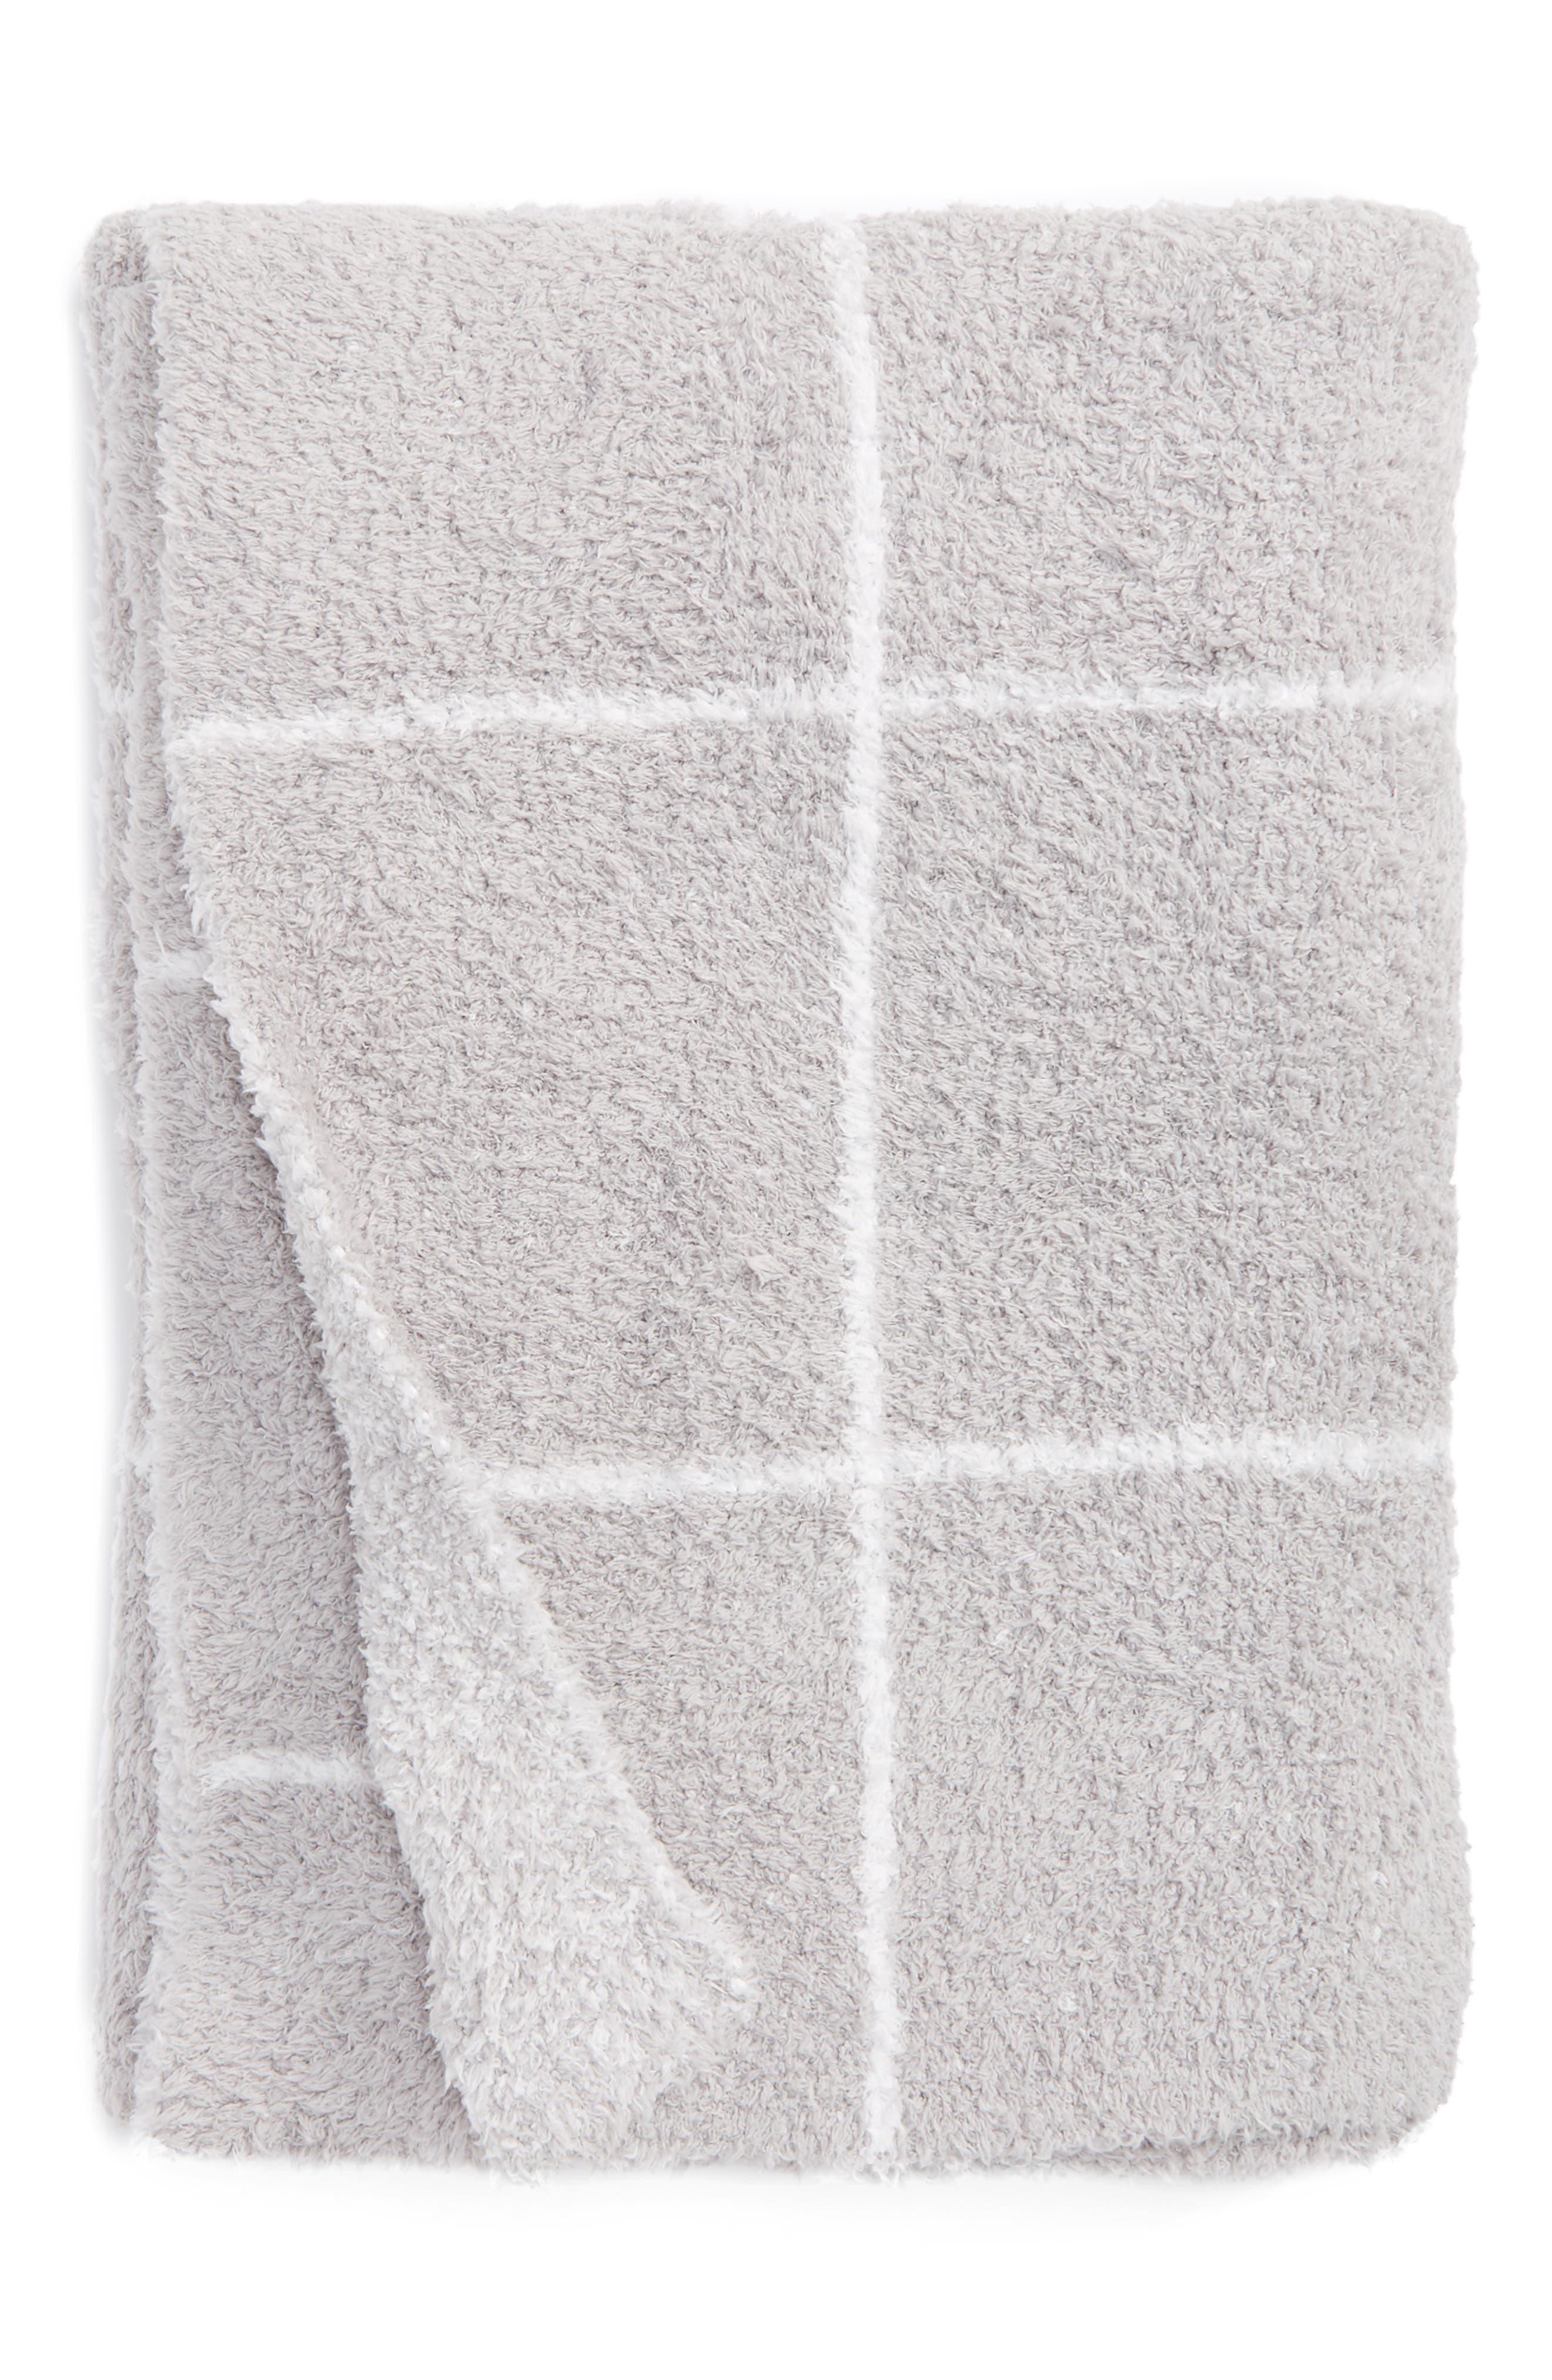 Main Image - Barefoot Dreams® Cozychic® Windowpane Plaid Throw Blanket